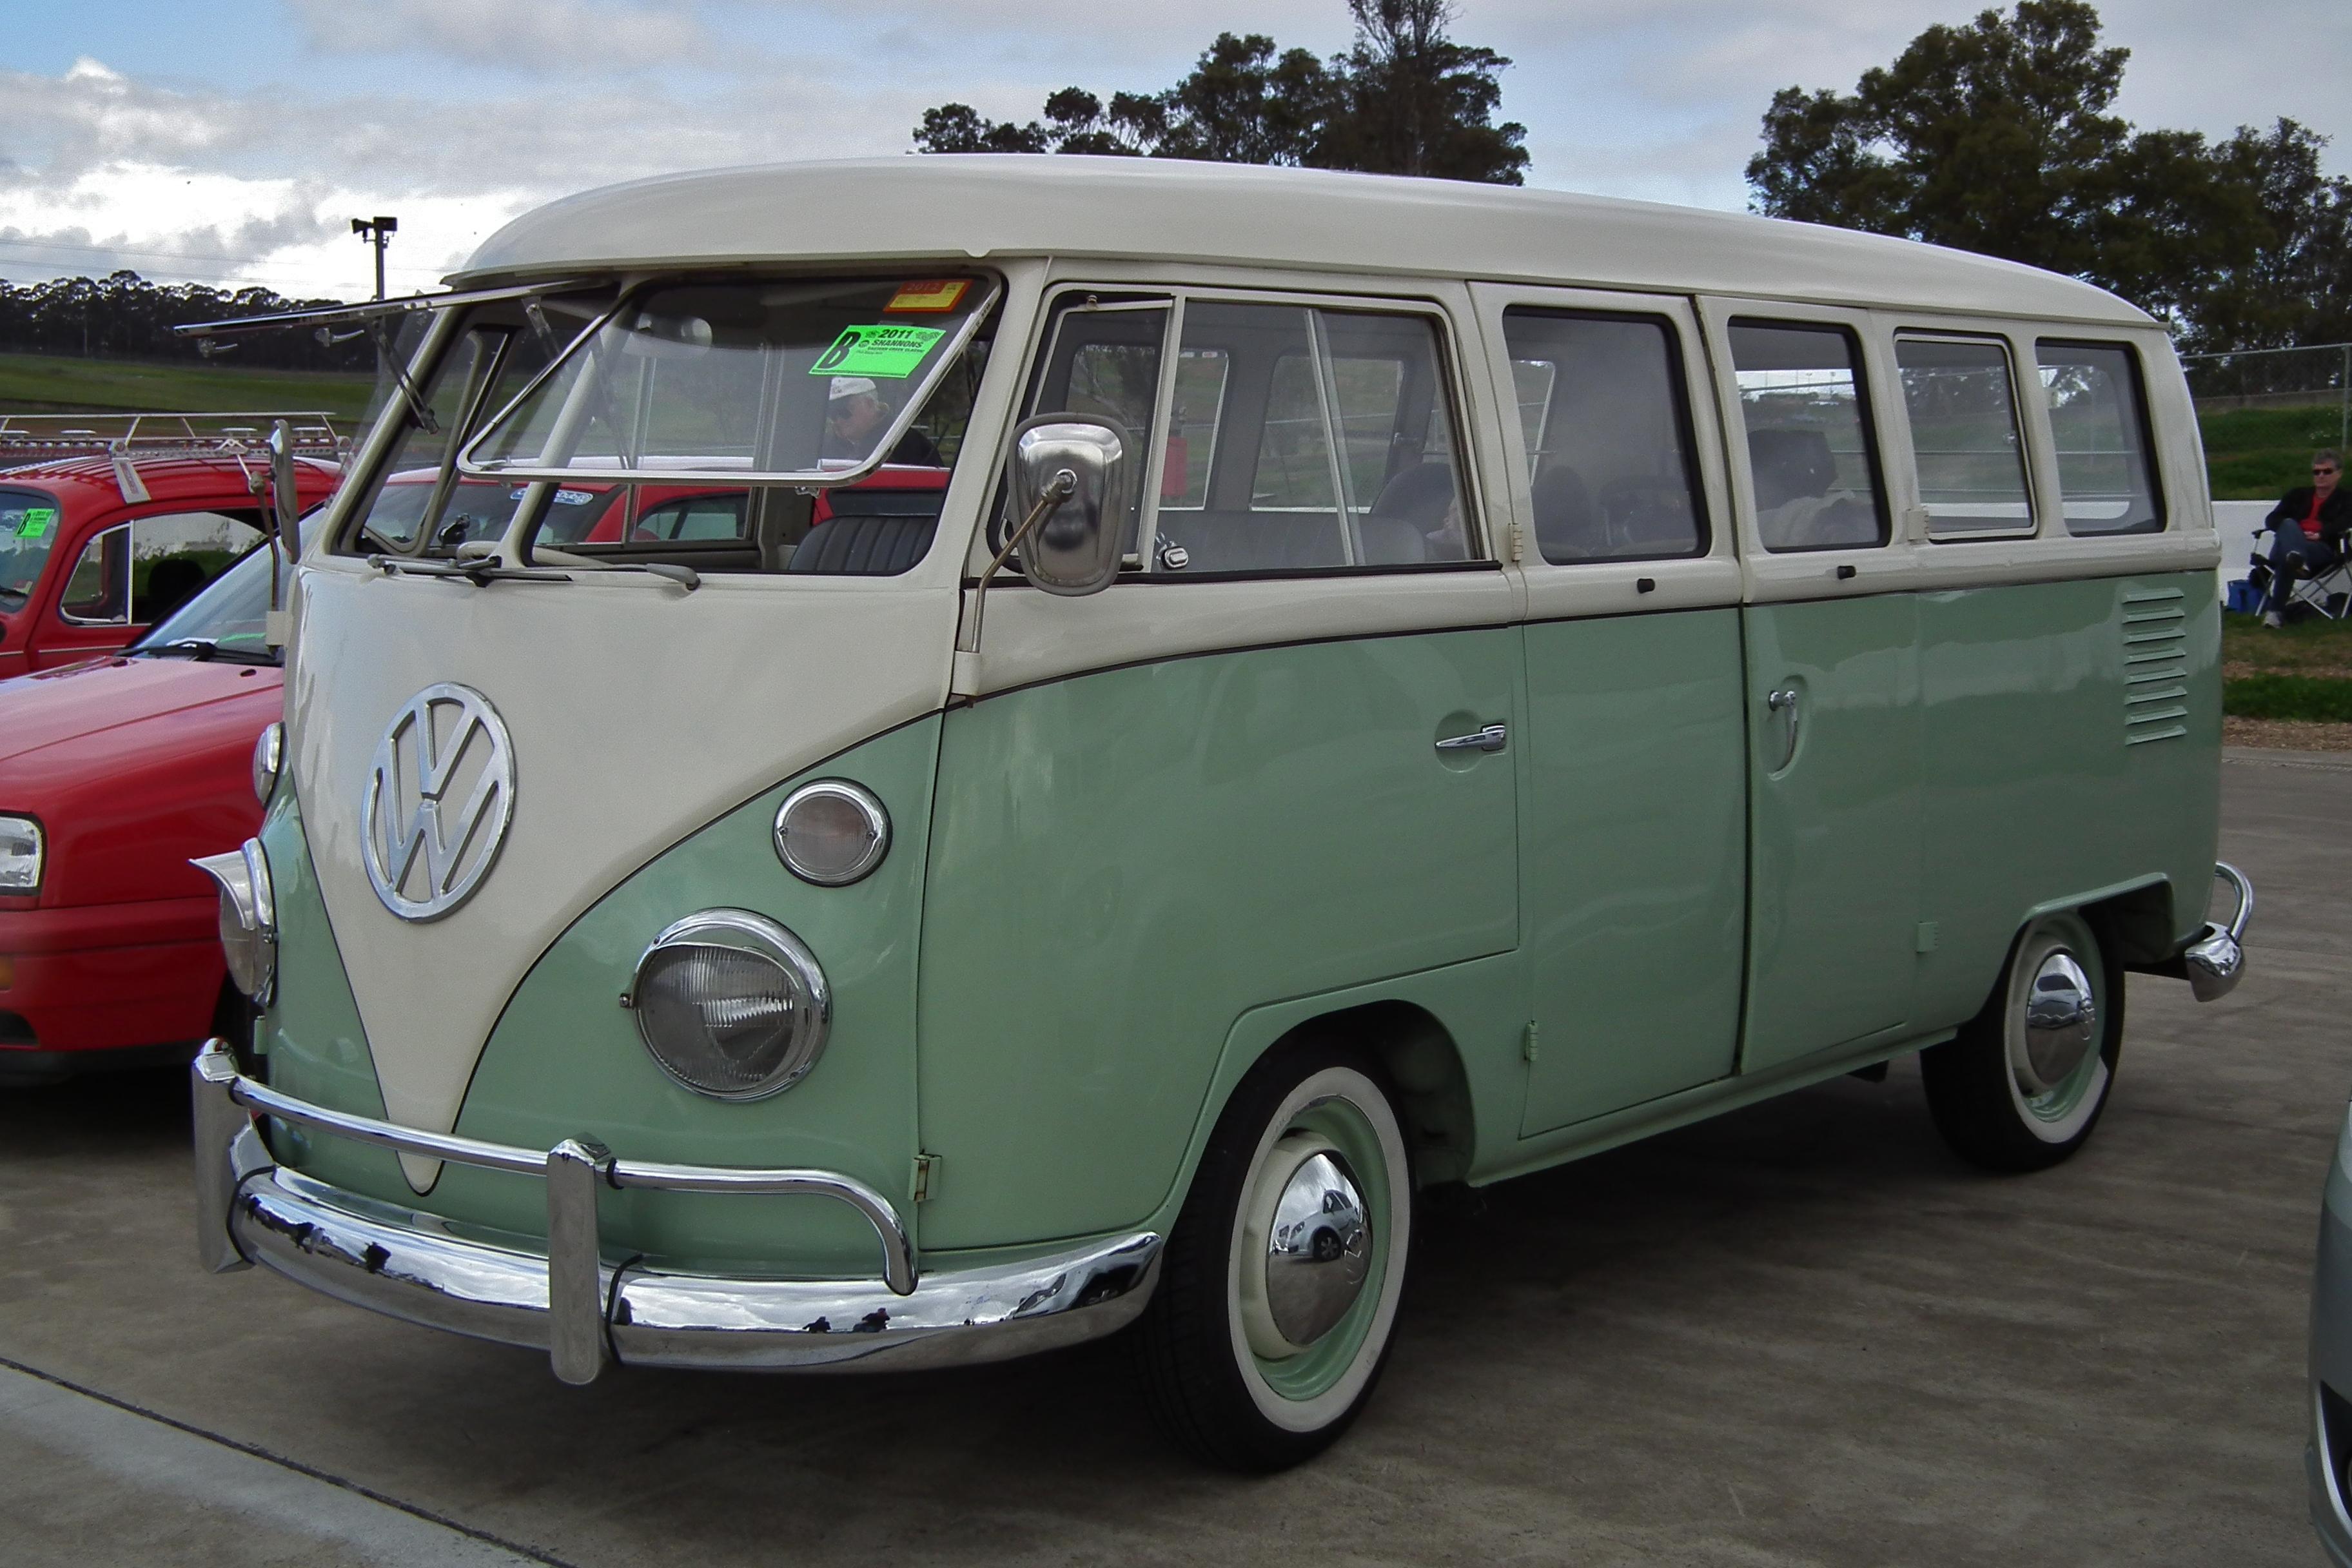 file 1964 volkswagen t1 transporter kombi bus 6105785703 jpg wikimedia commons. Black Bedroom Furniture Sets. Home Design Ideas